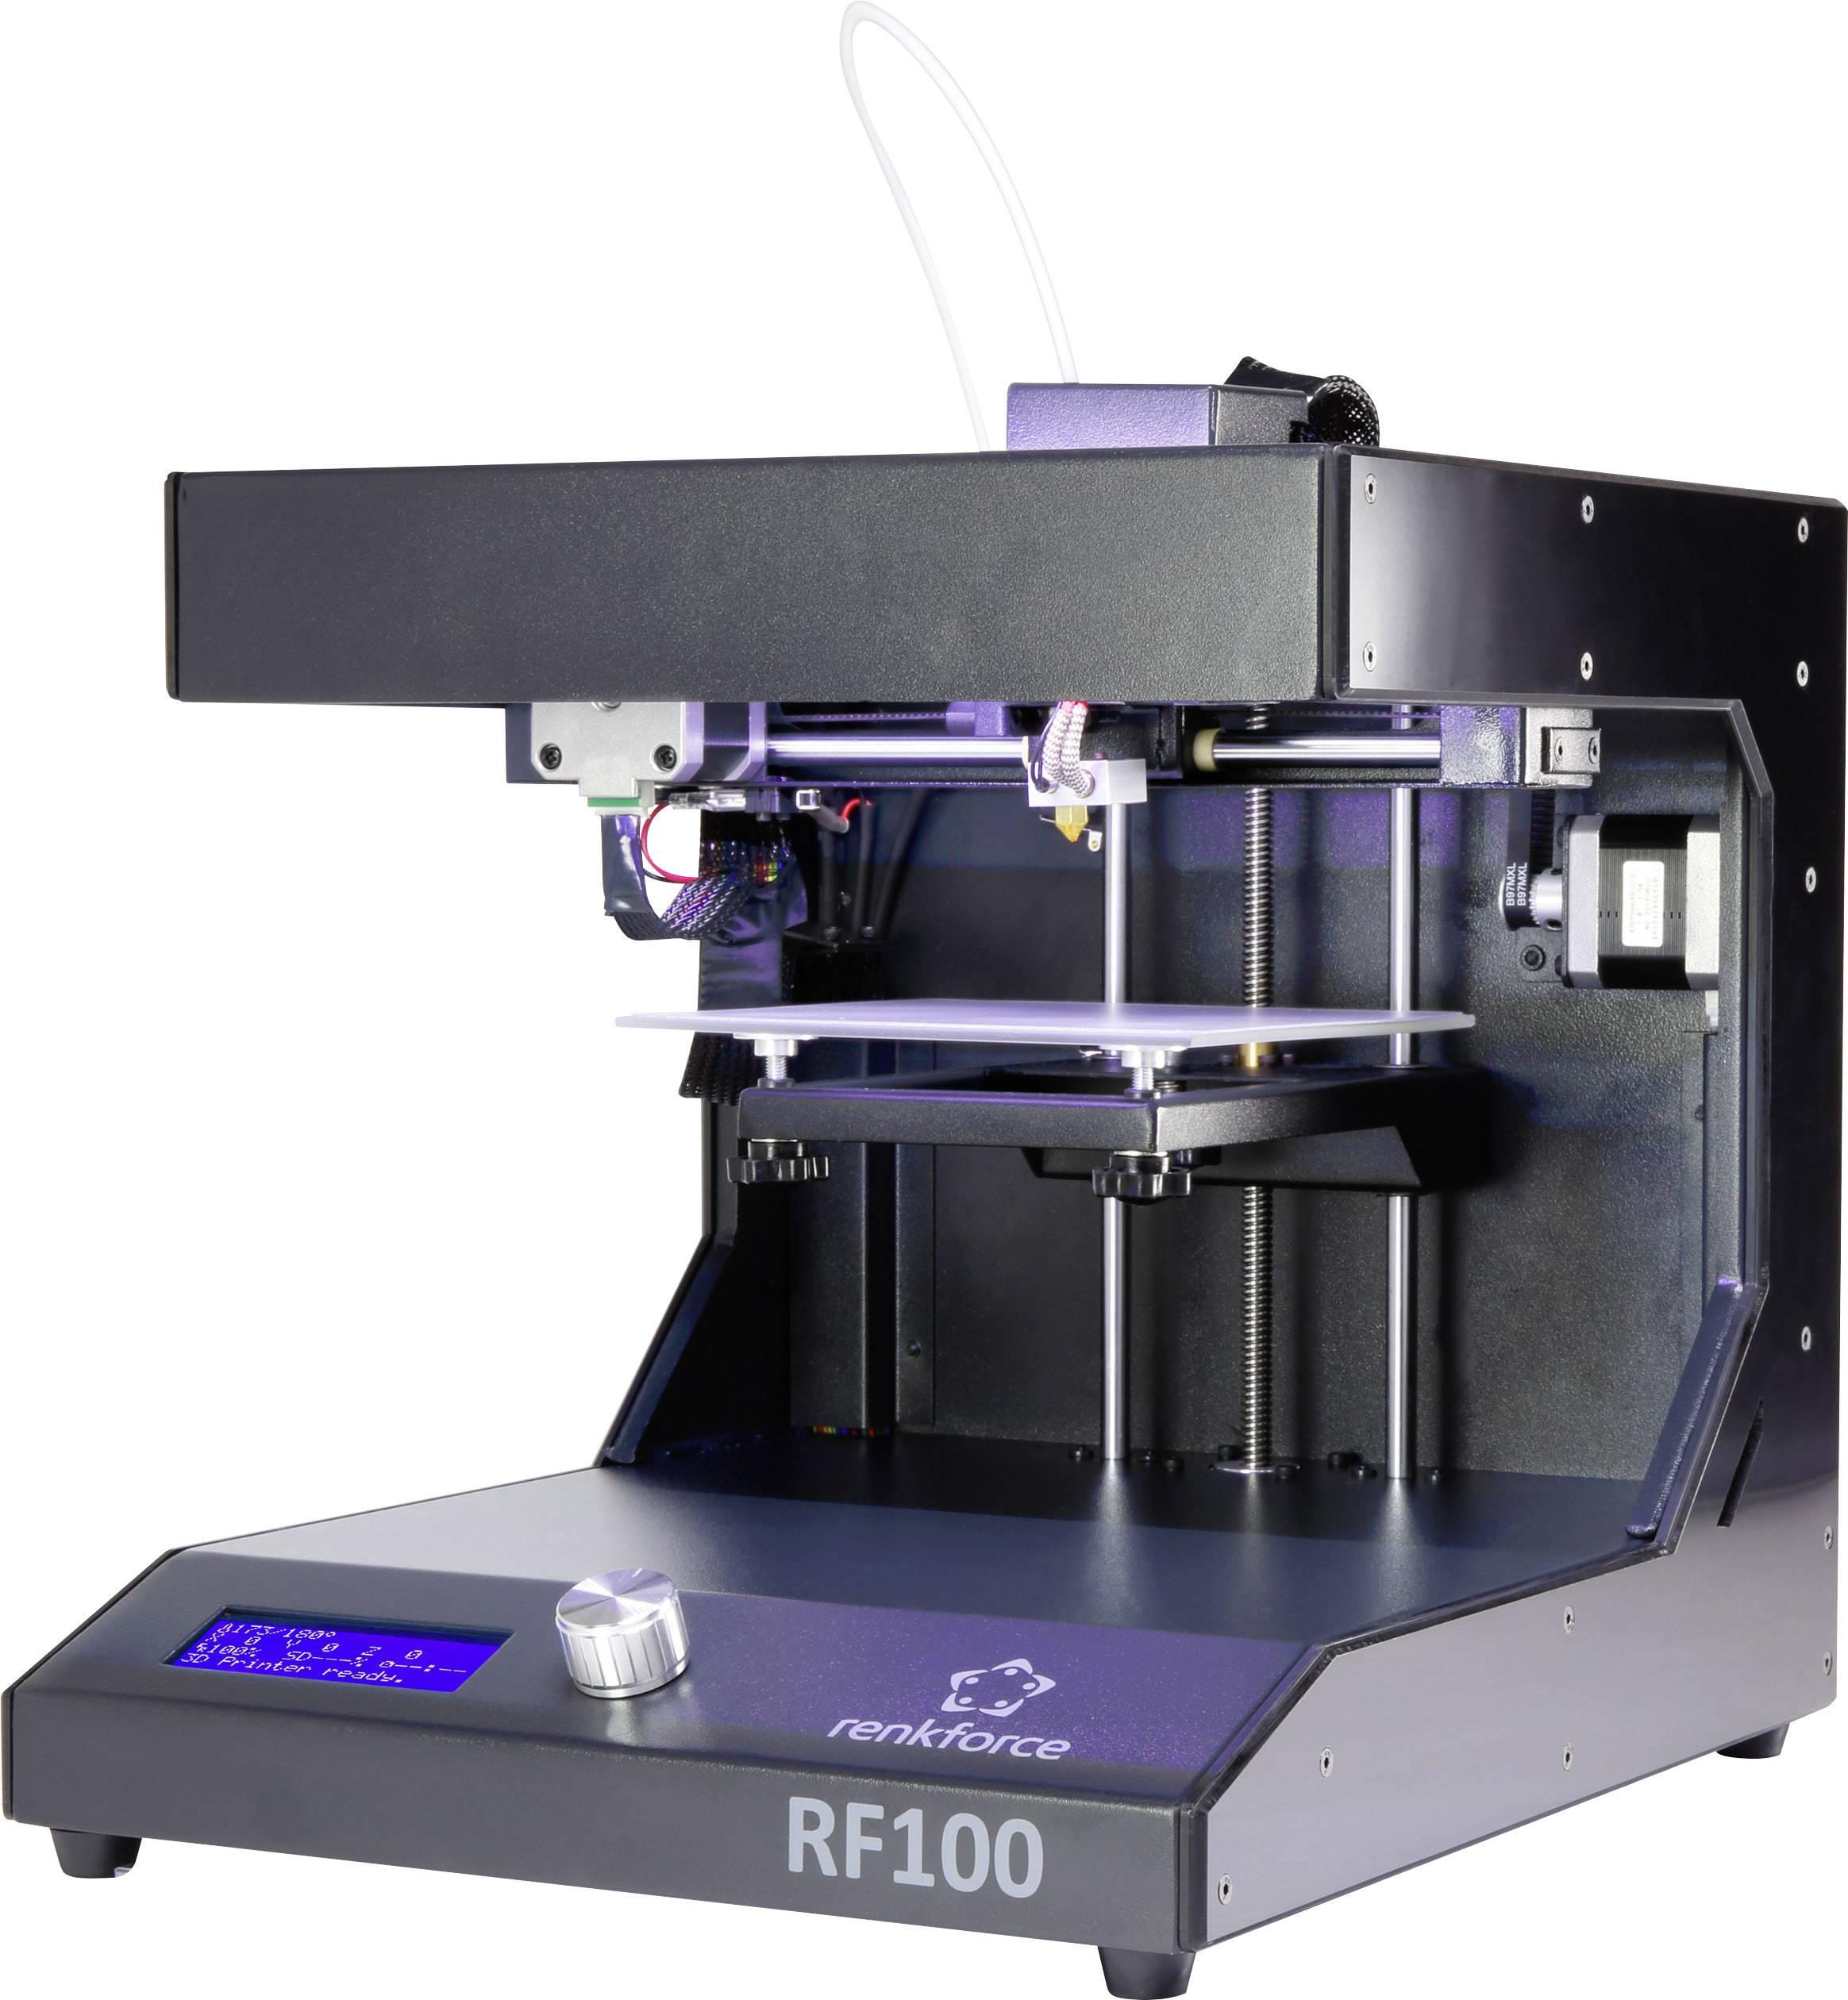 3D tiskárna Renkforce RF100 - Test časopisu Computer